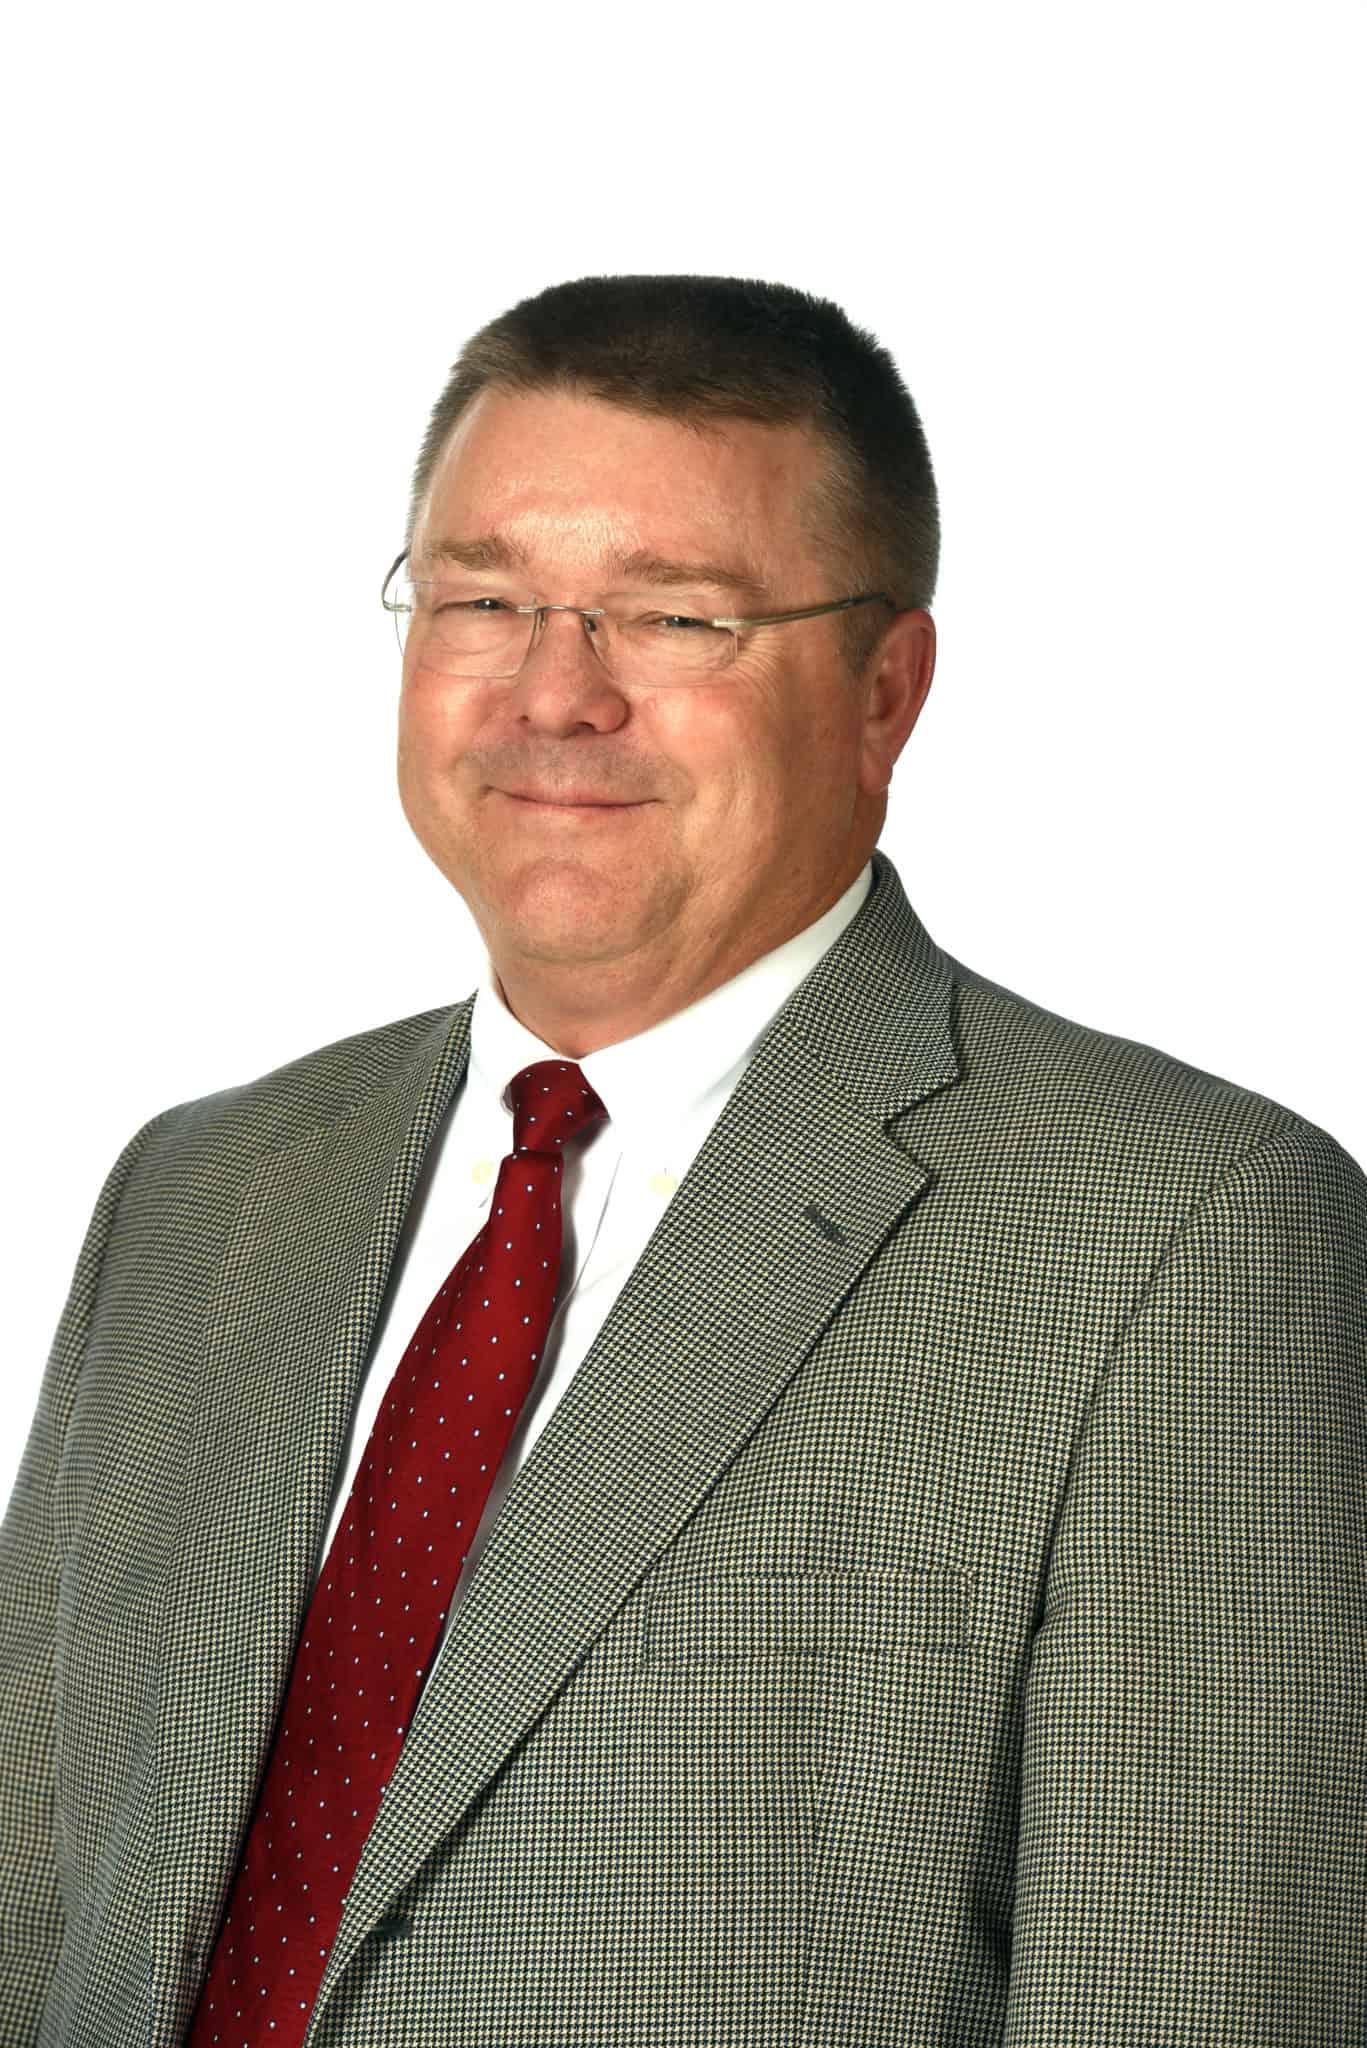 Jim Clardy, M.D.